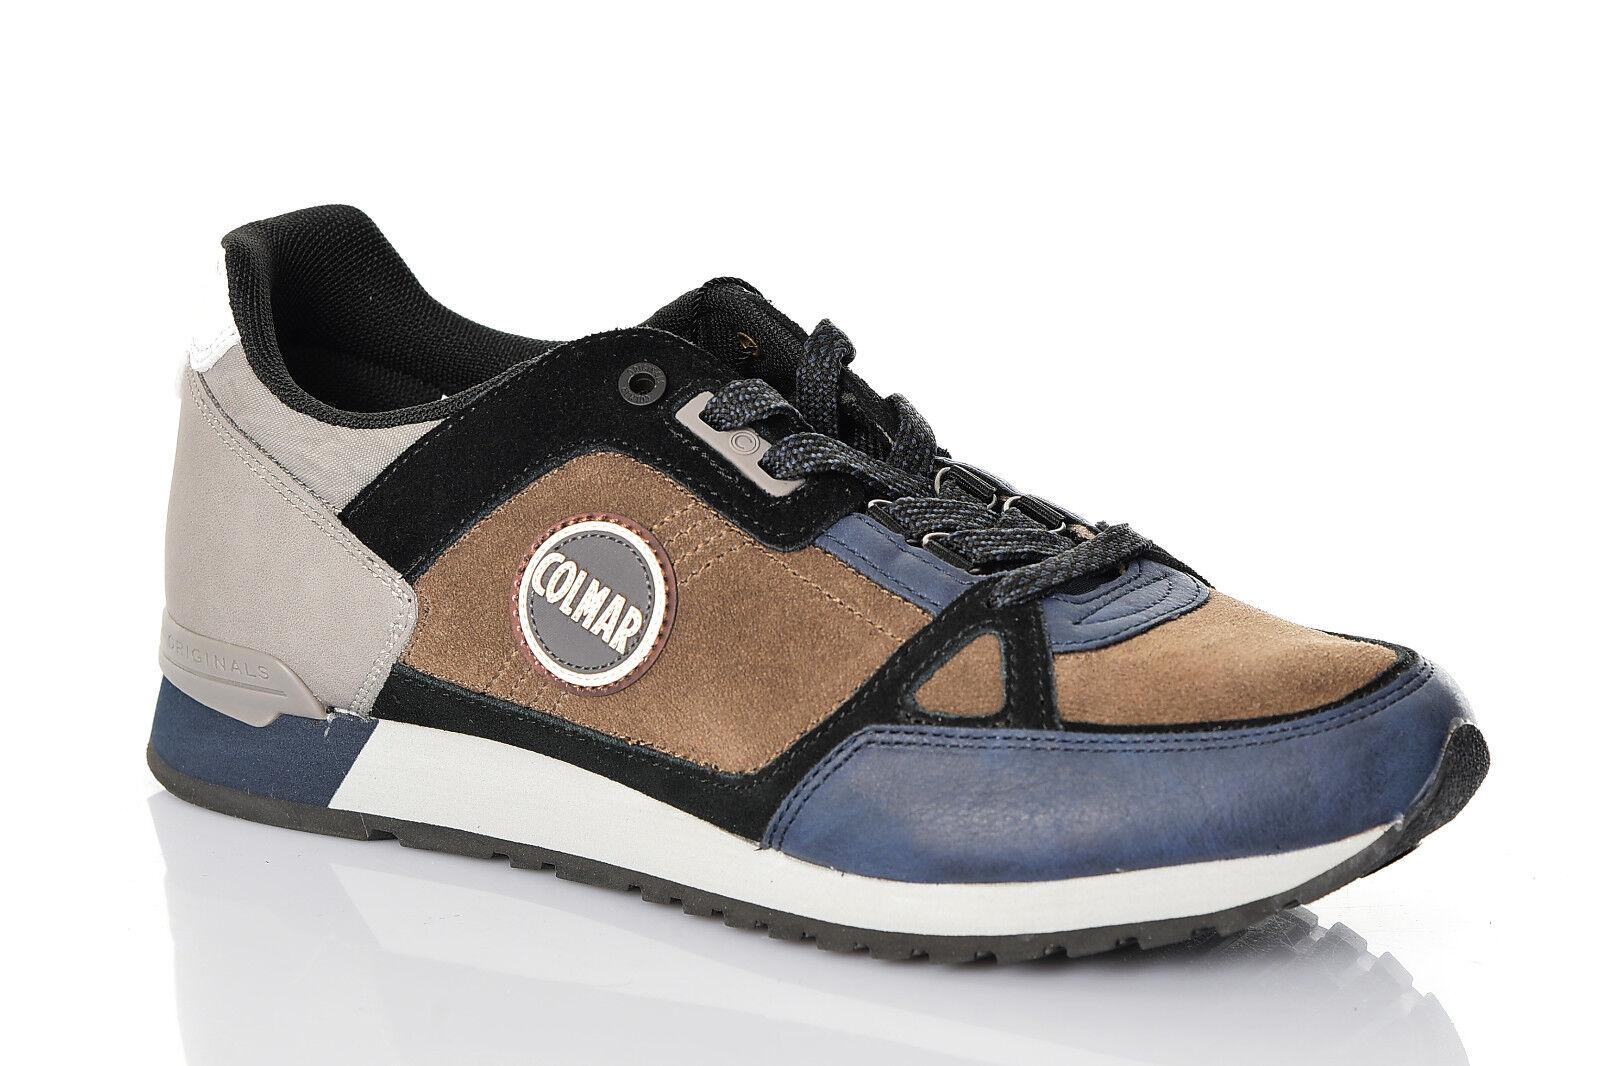 Sneakers men Colmar Travis Supreme Pad 2018 2019 shoes Pelle brown blue Nuove